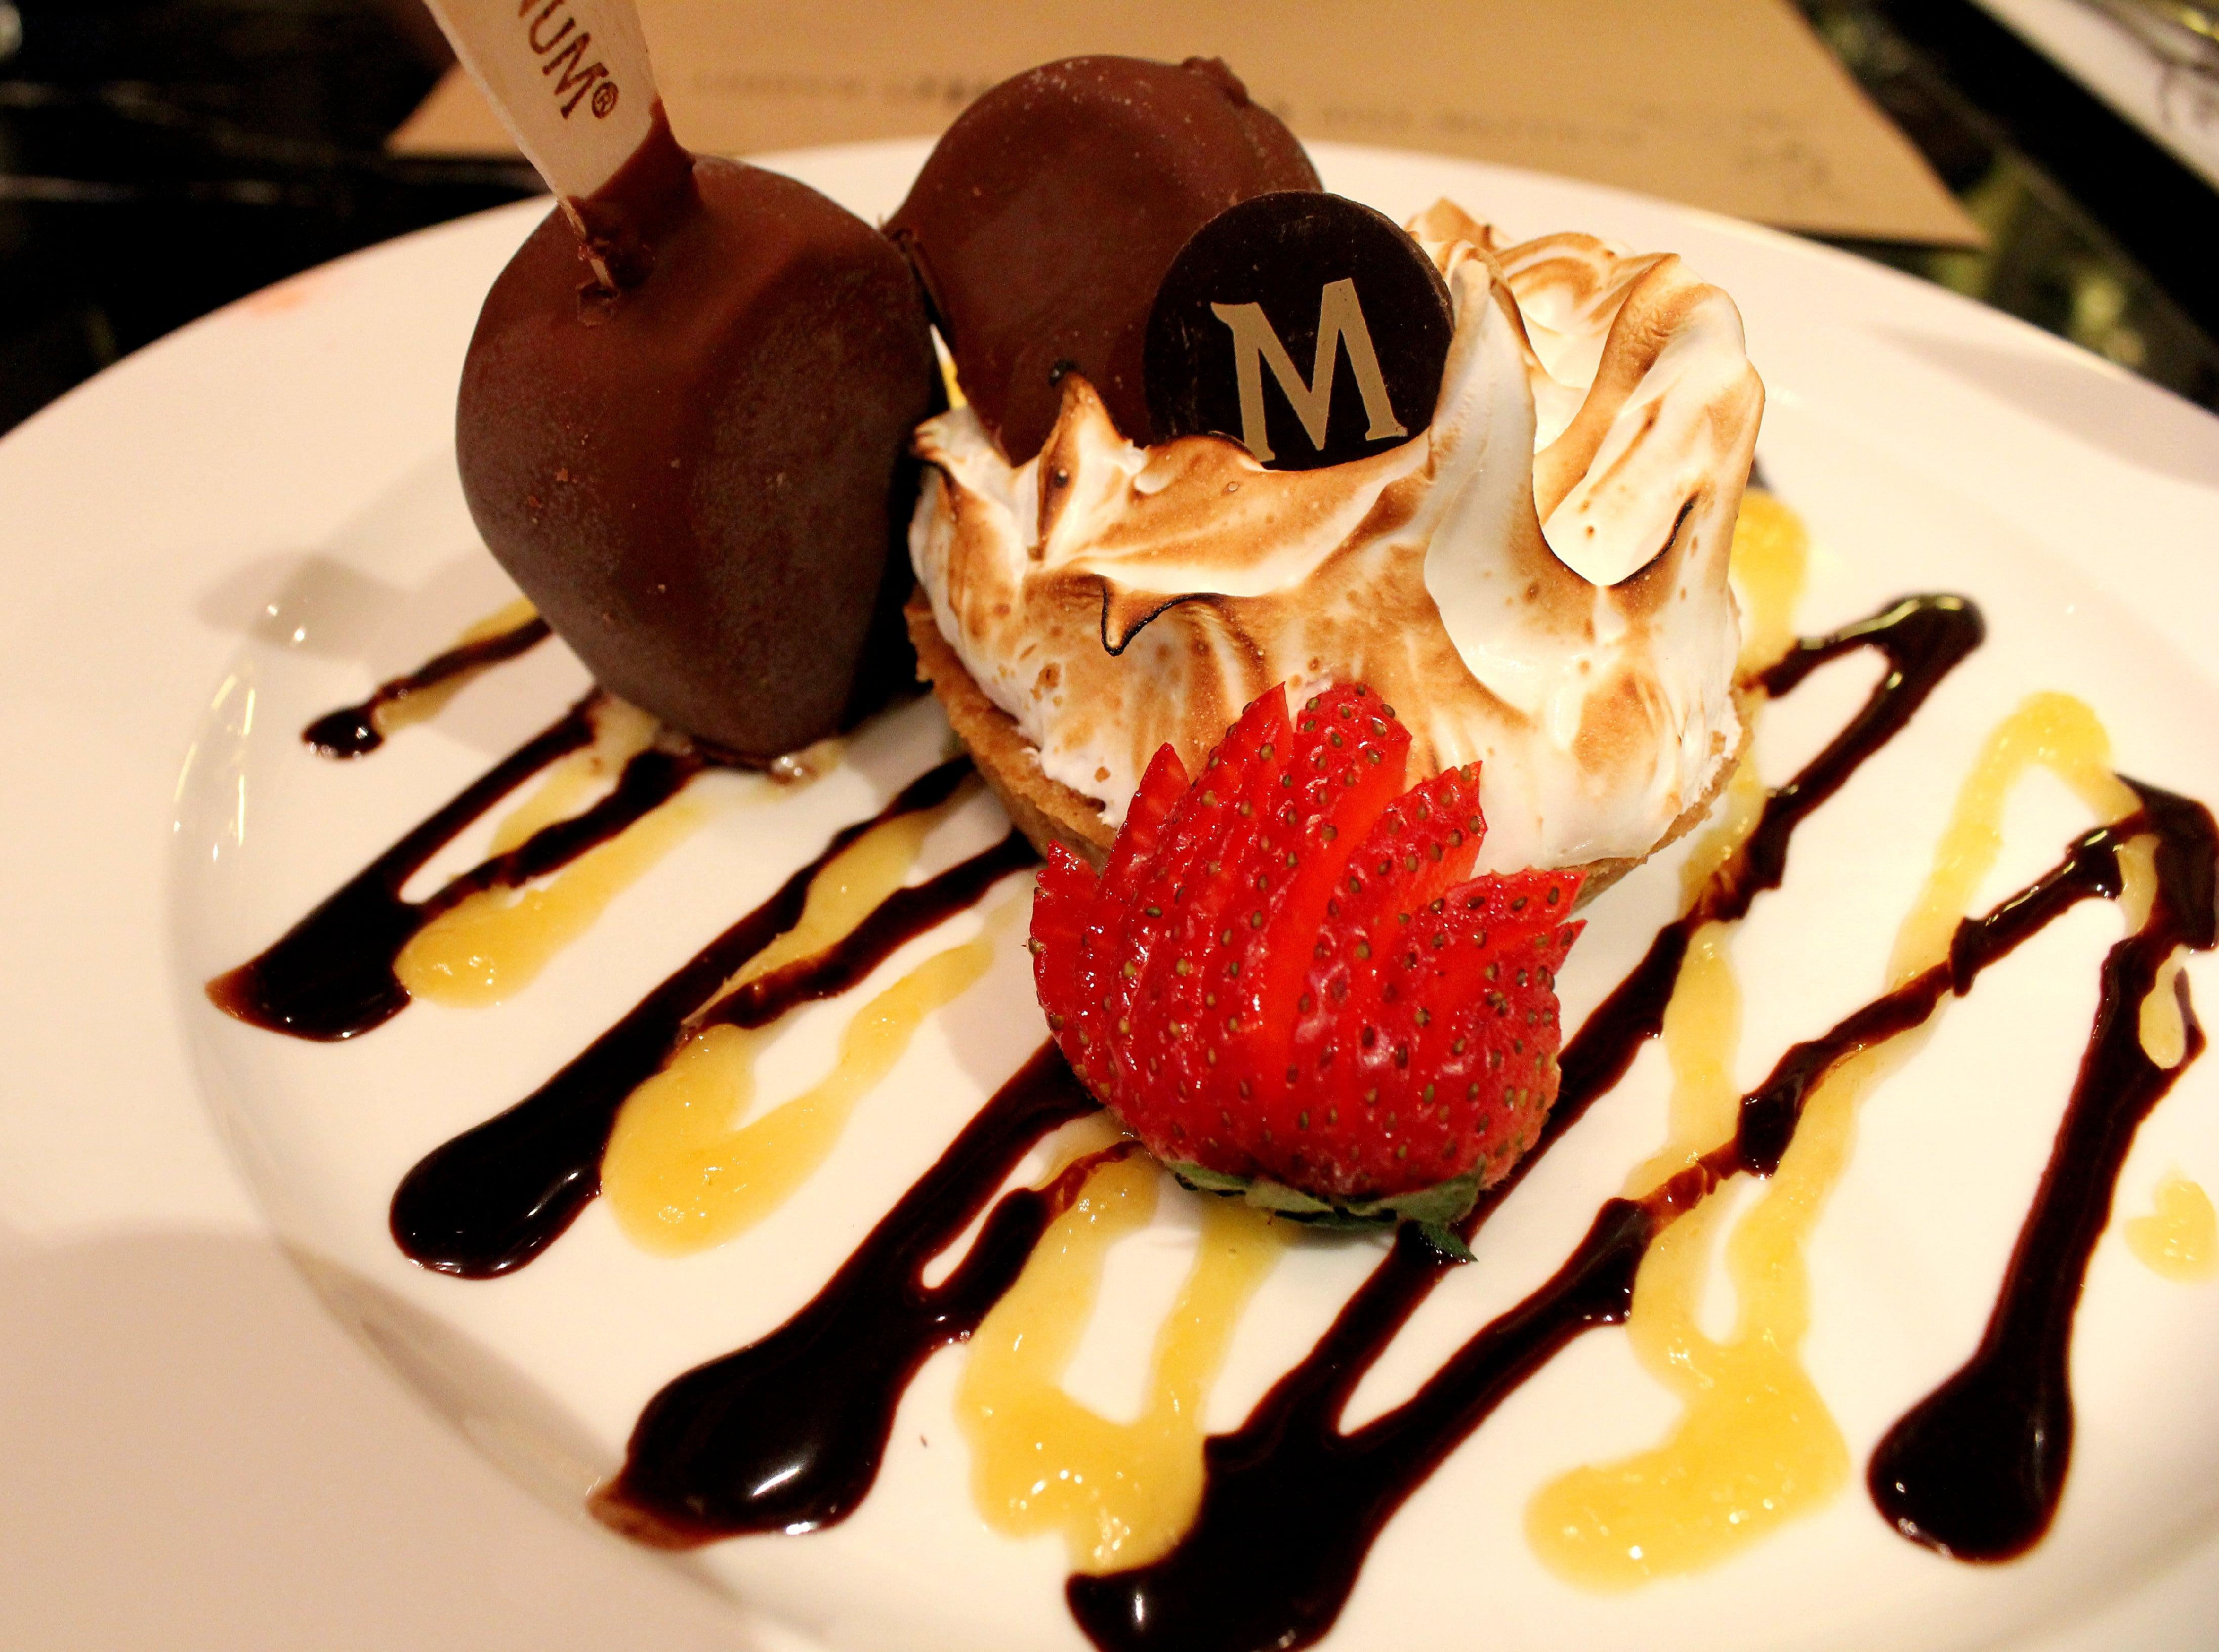 Lemon Meringue Tart with Chocolate Magnum Ice Cream at The Magnum Cafe, Bangkok